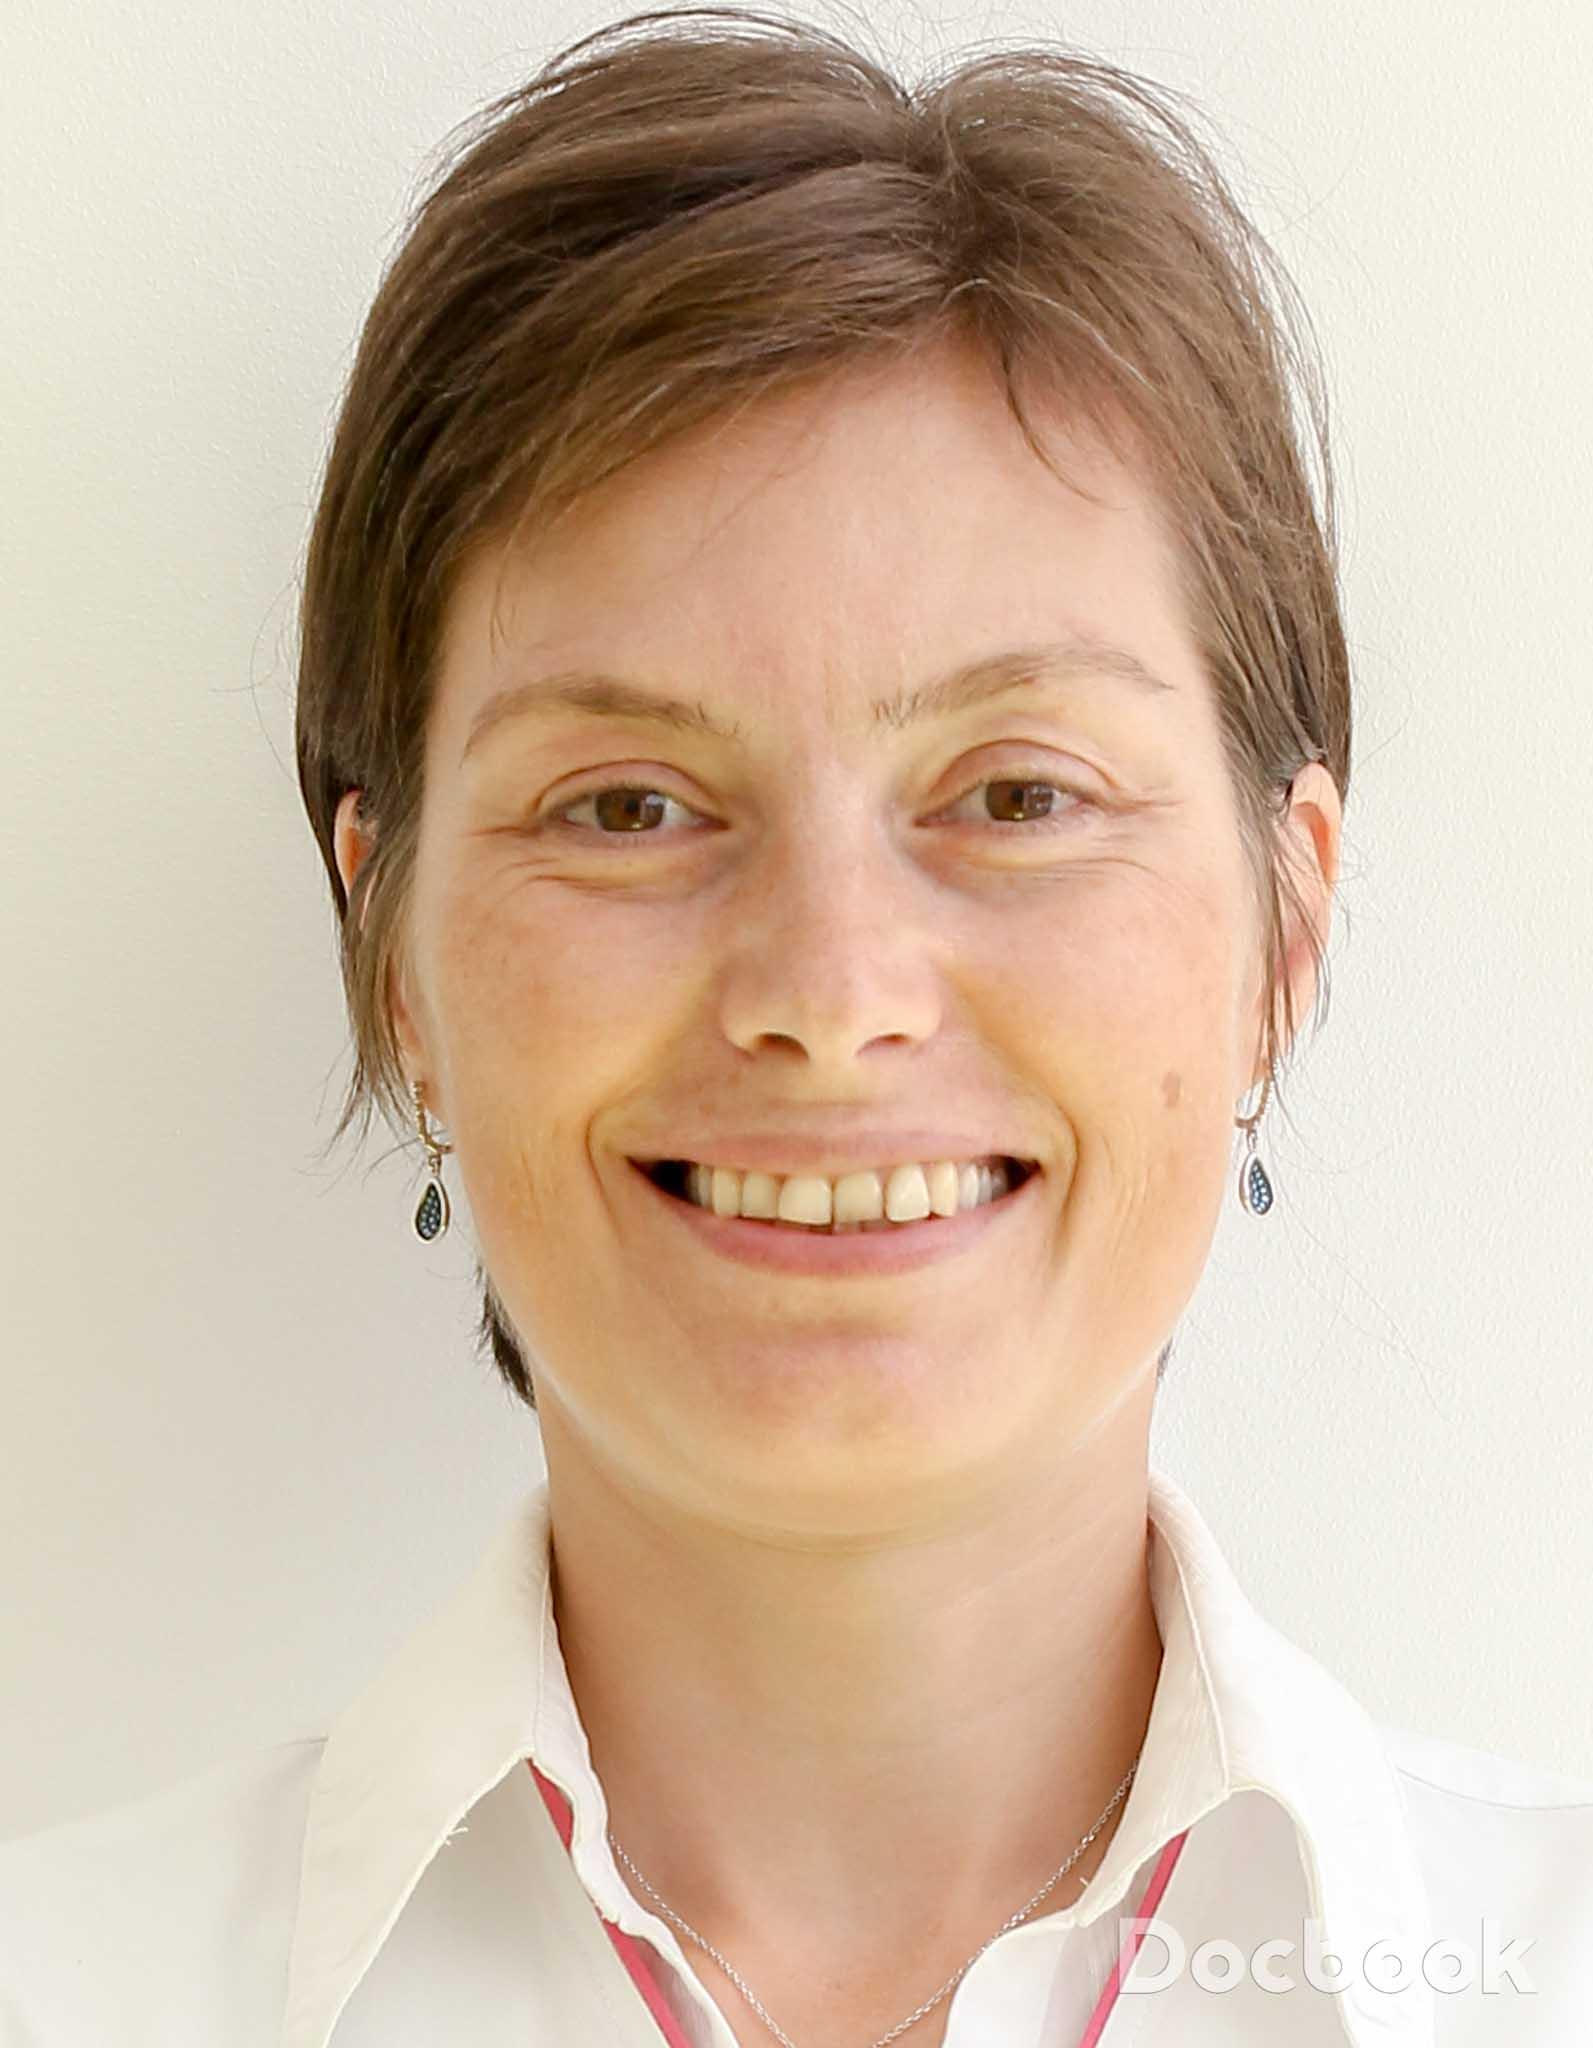 Dr. Ioana Barbulea